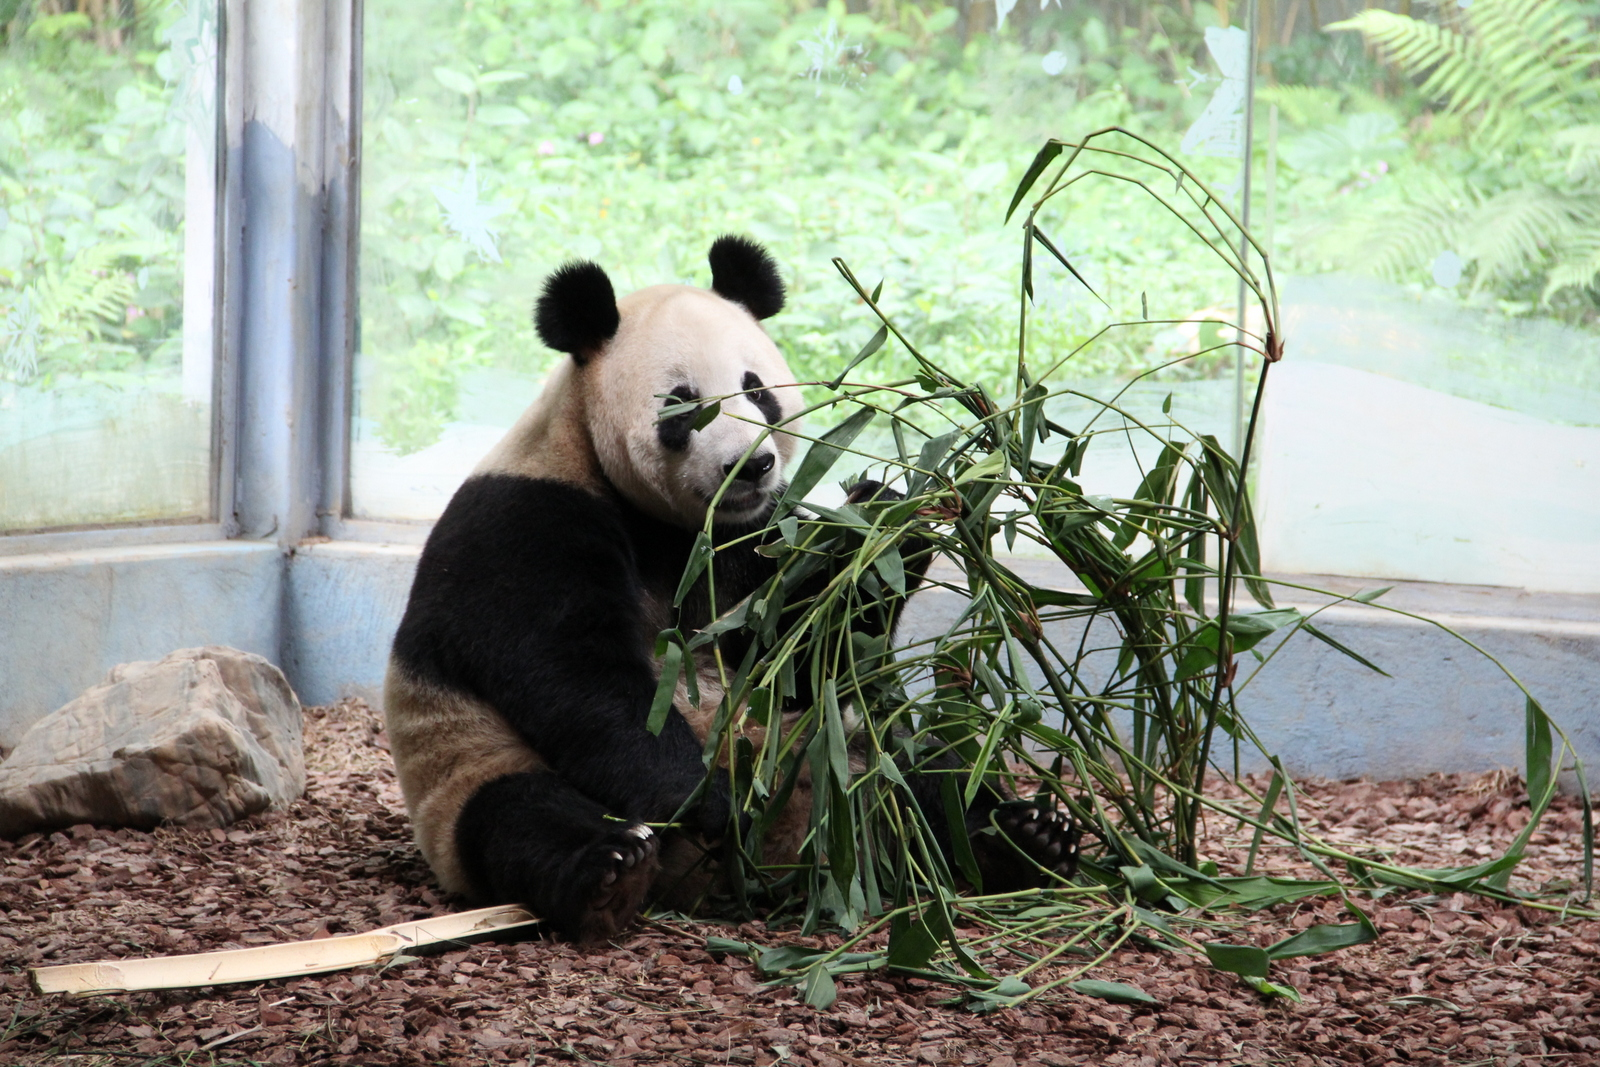 We love Pandas!